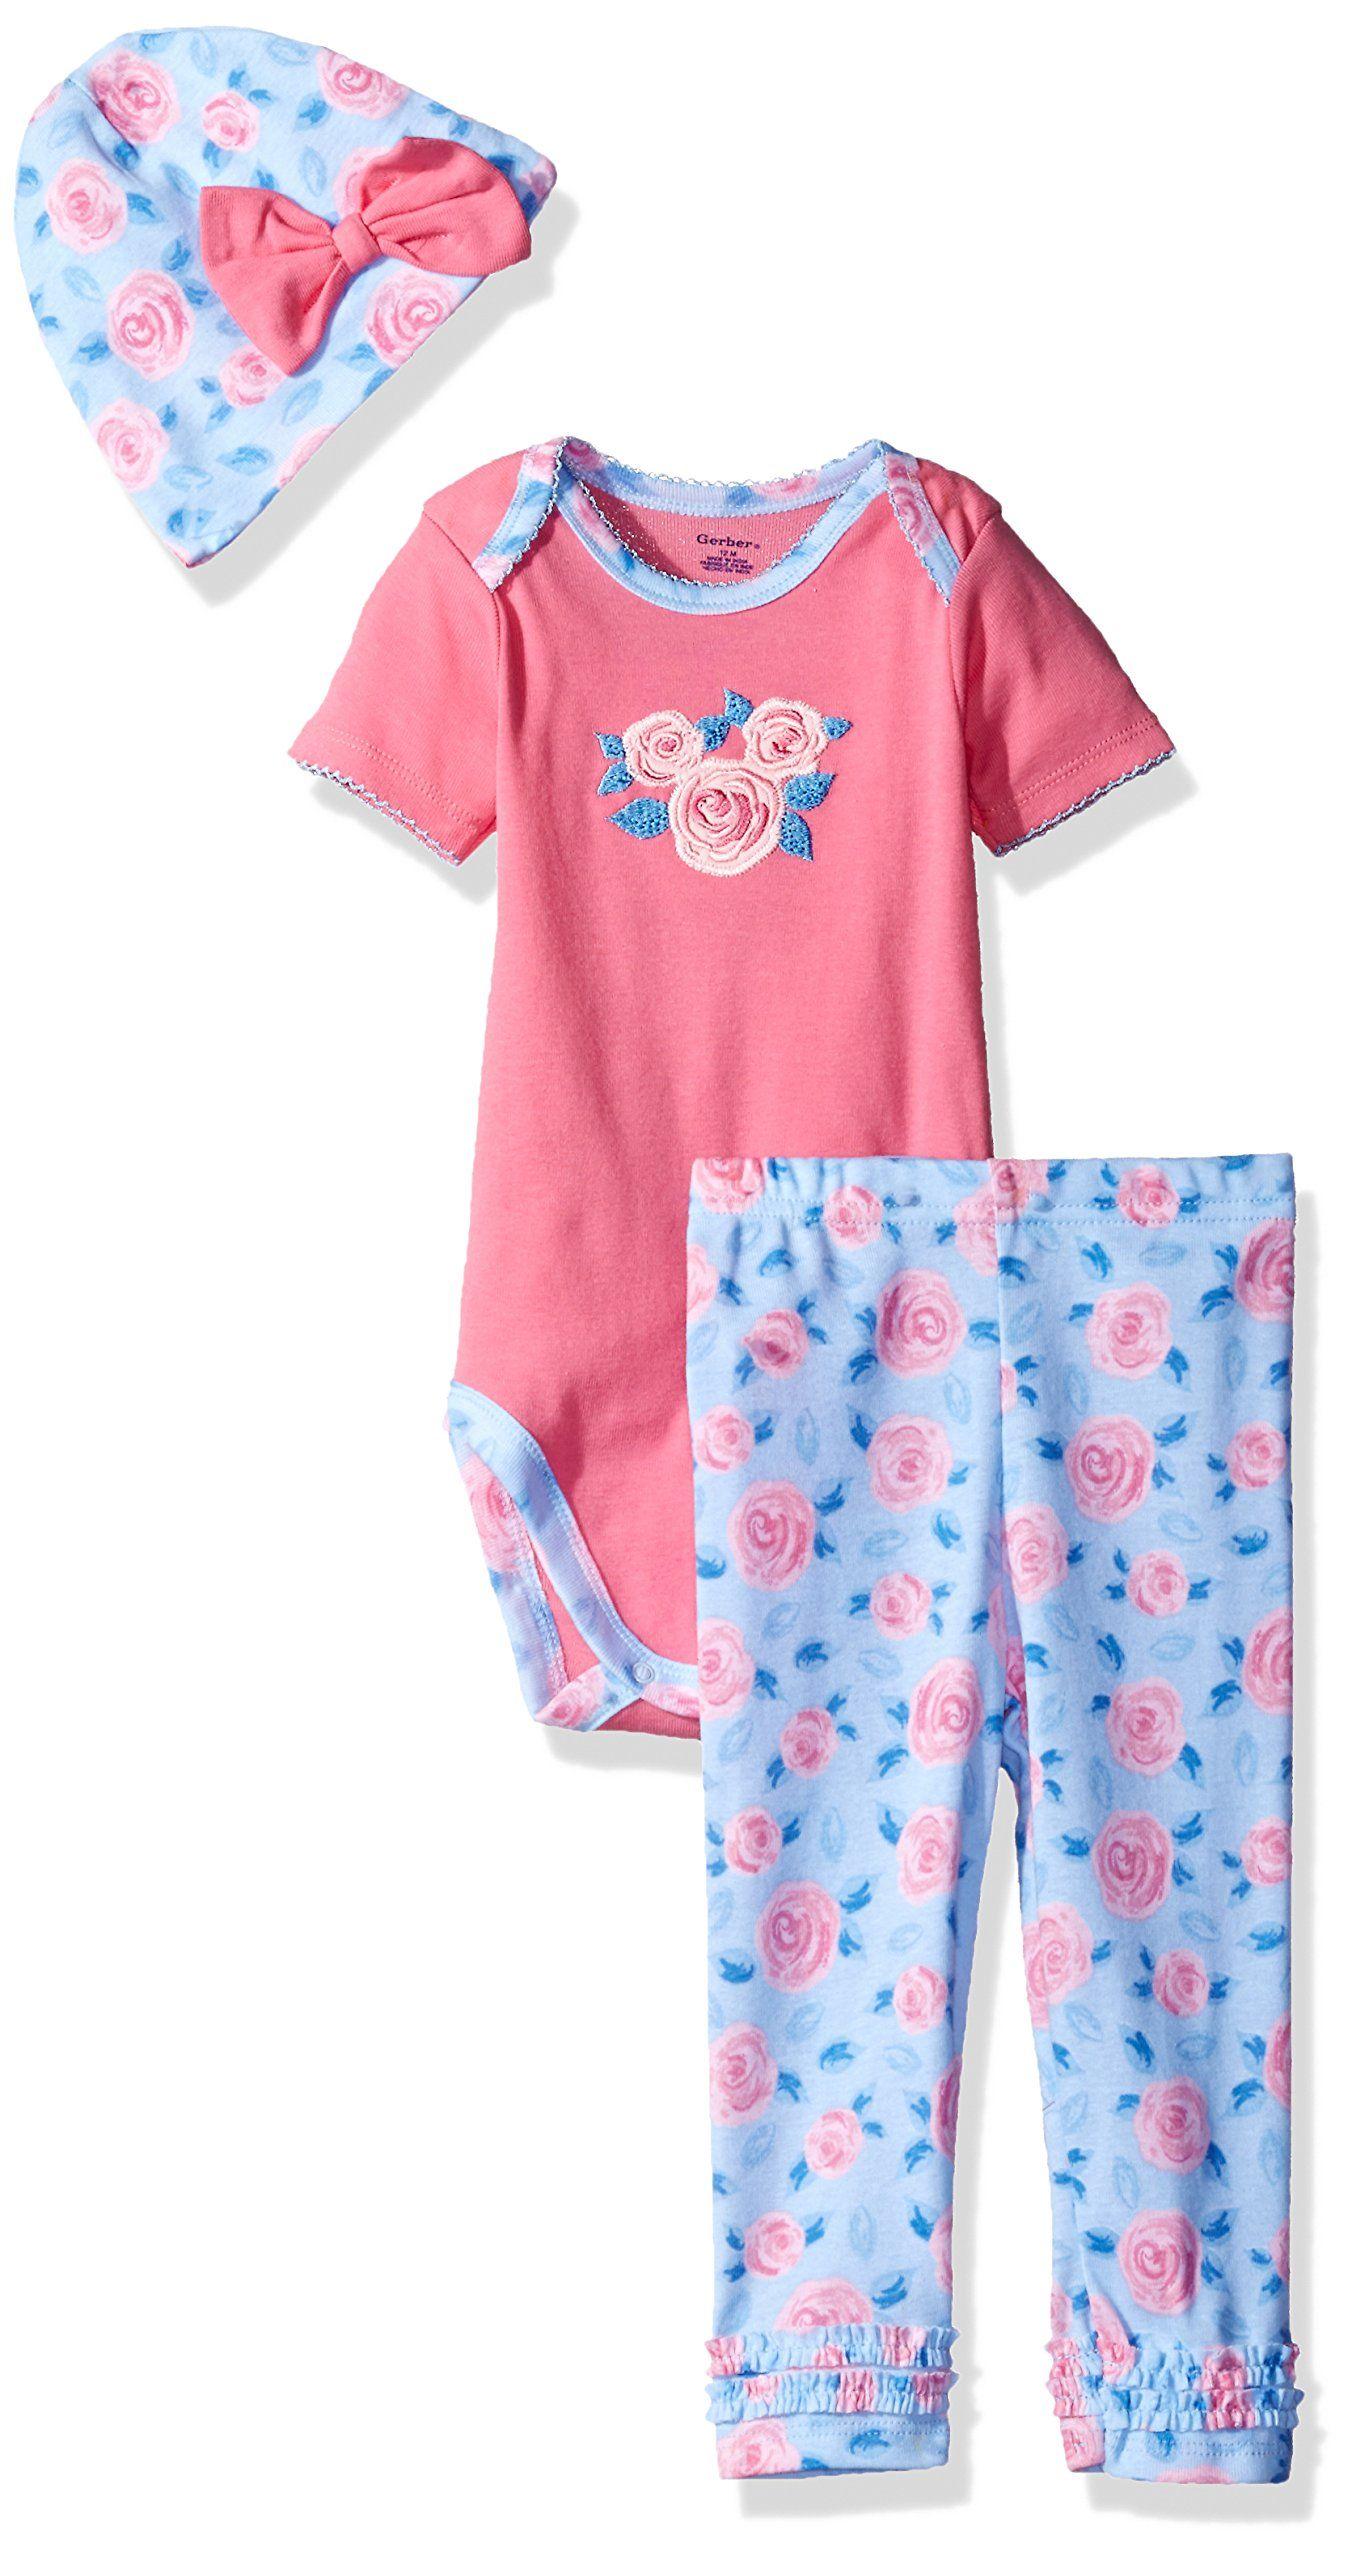 Gerber Baby Girls 3-Piece Bodysuit Legging and Cap Set